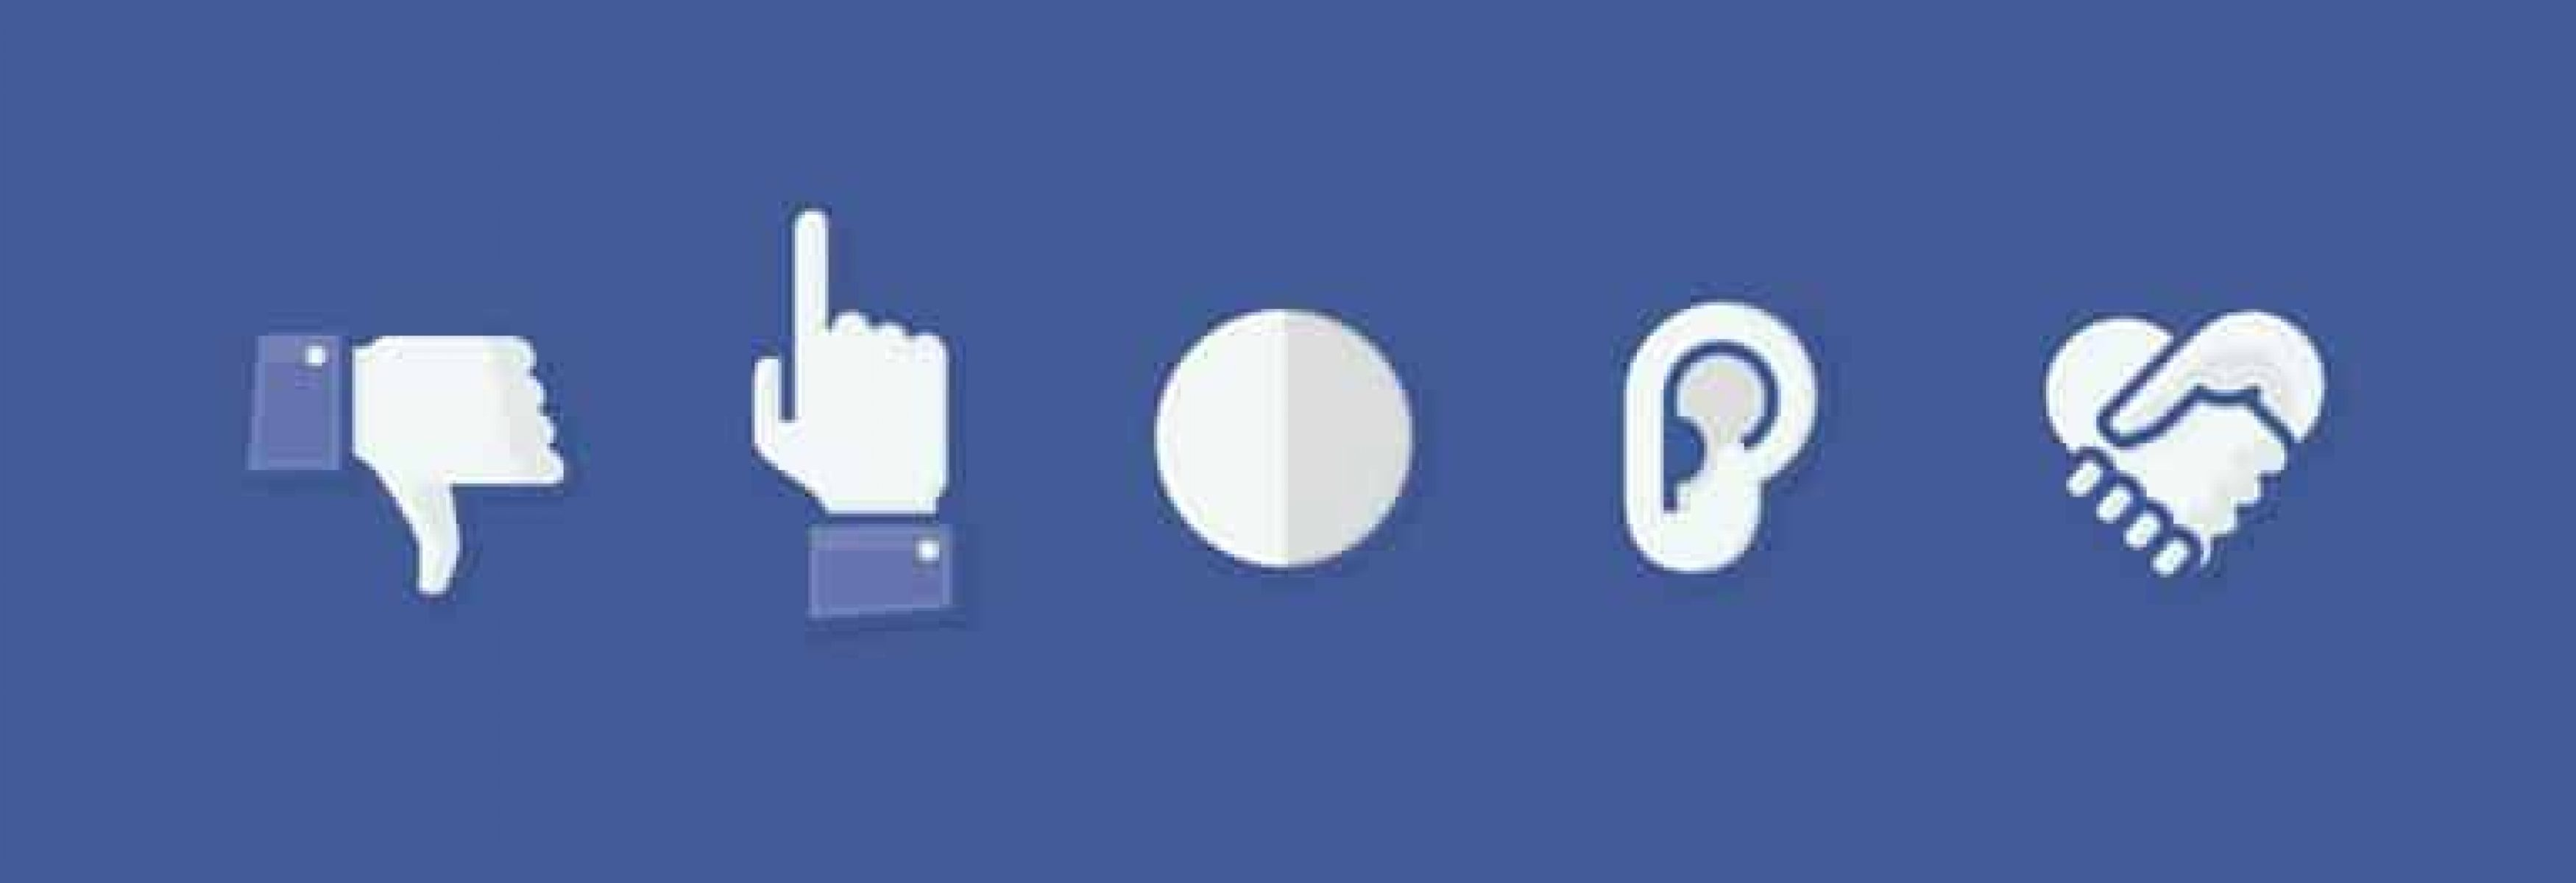 neutral_button-01-1024x512—web